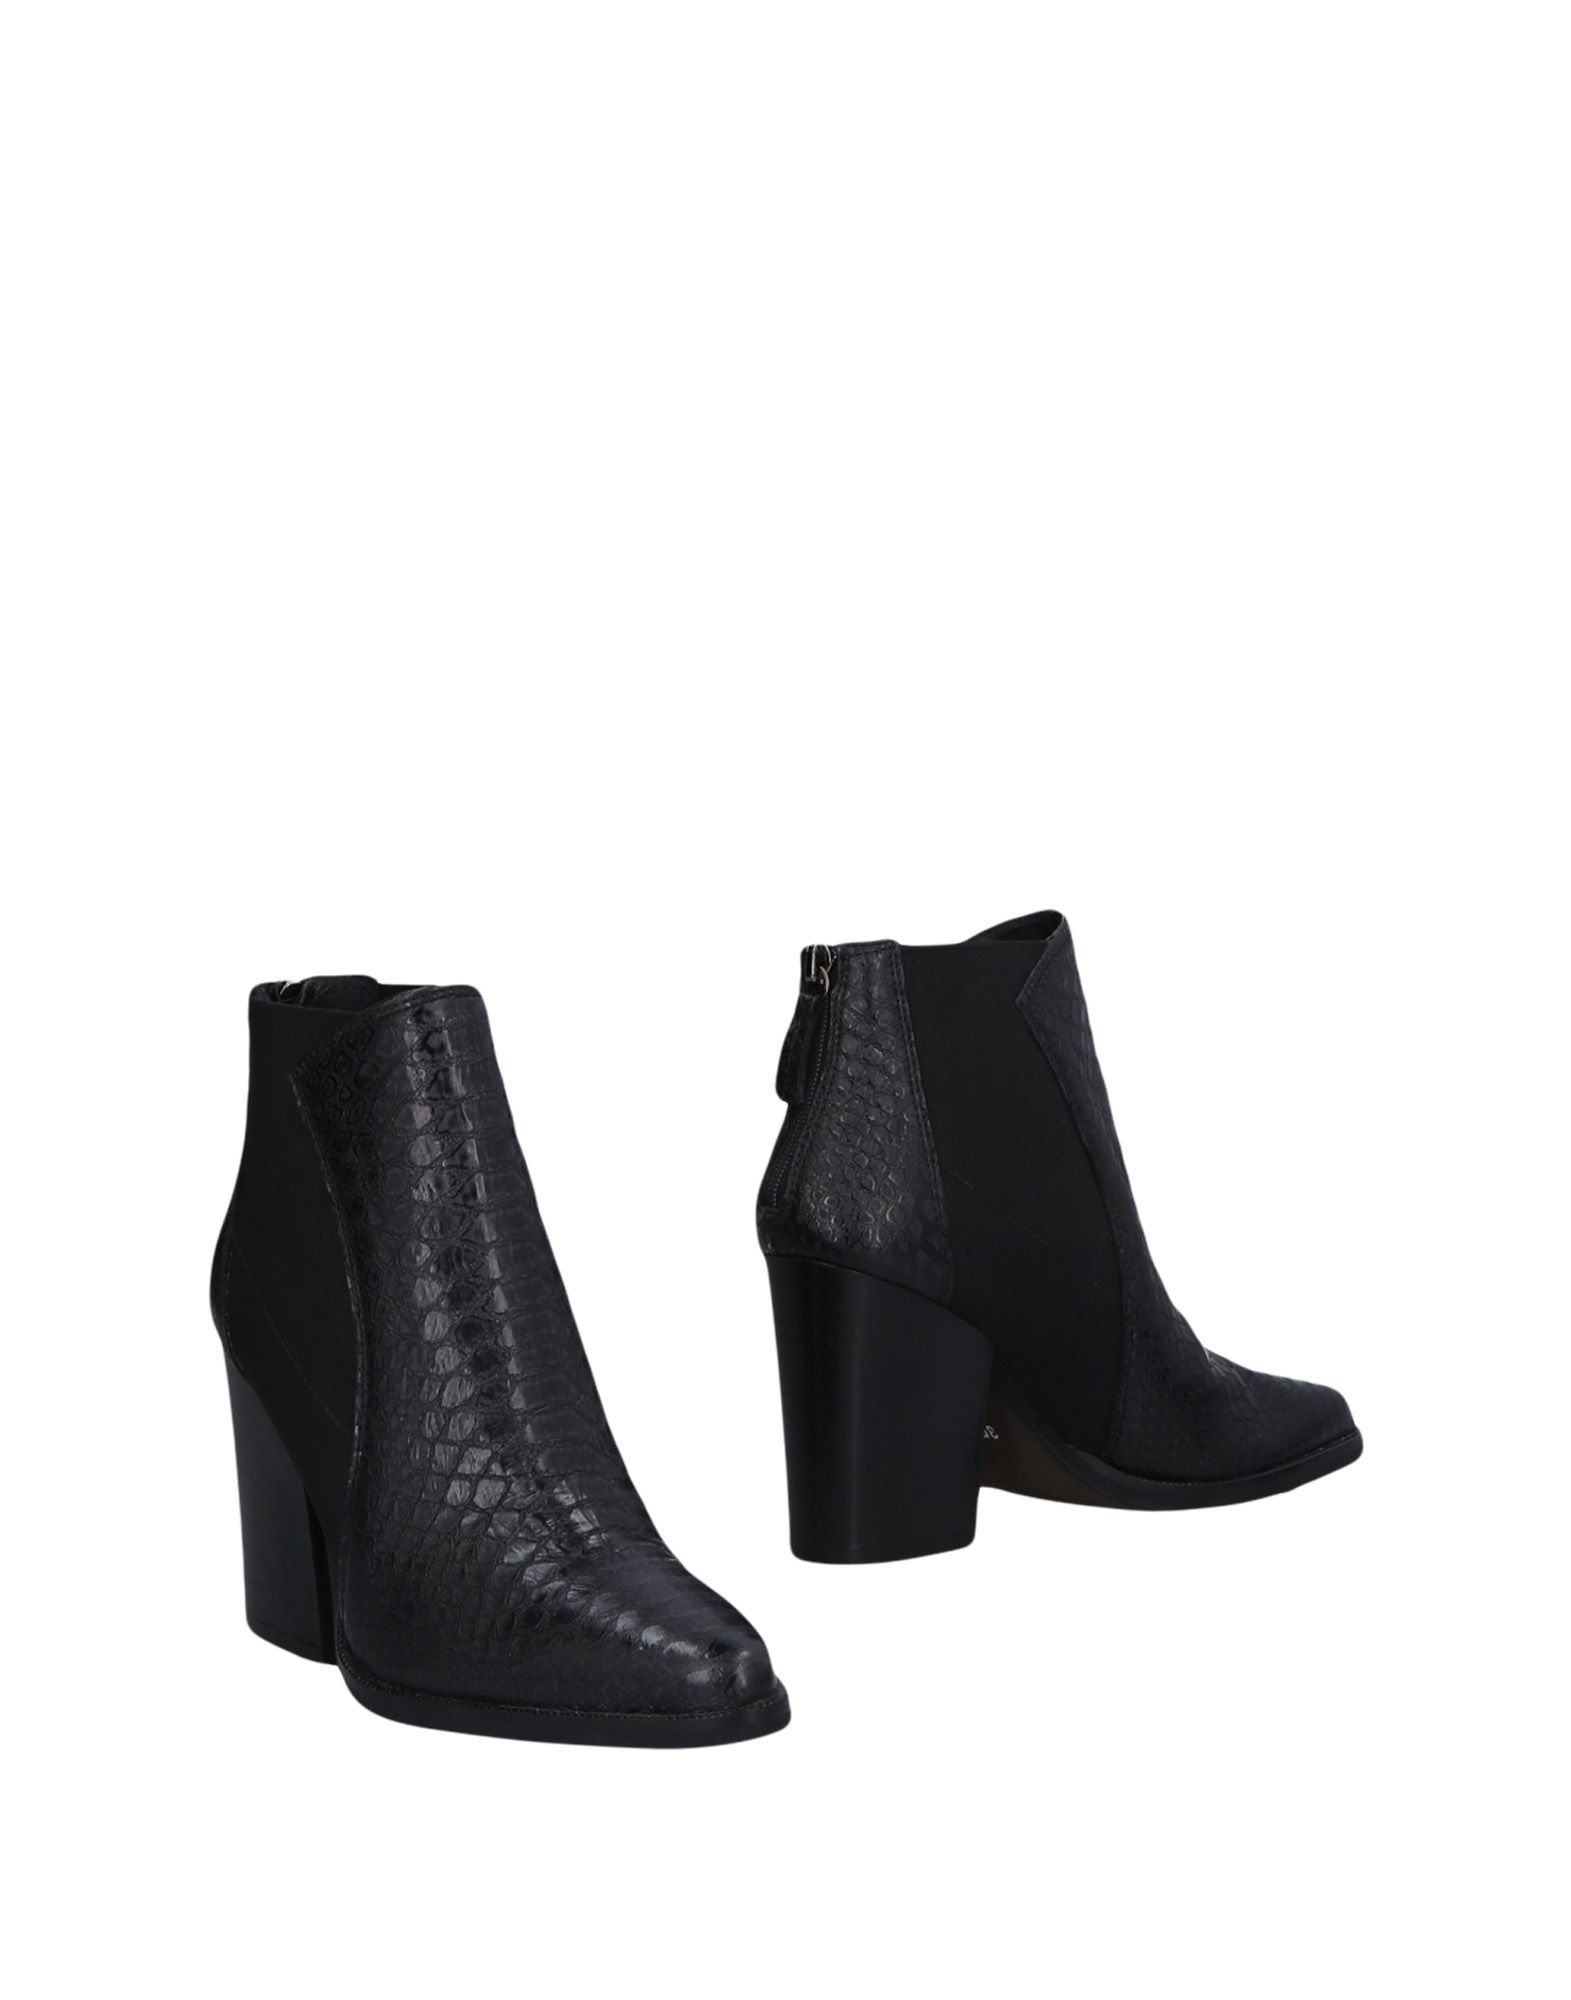 Peperosa Stiefelette Damen Qualität  11481739BW Gute Qualität Damen beliebte Schuhe 50c2e2